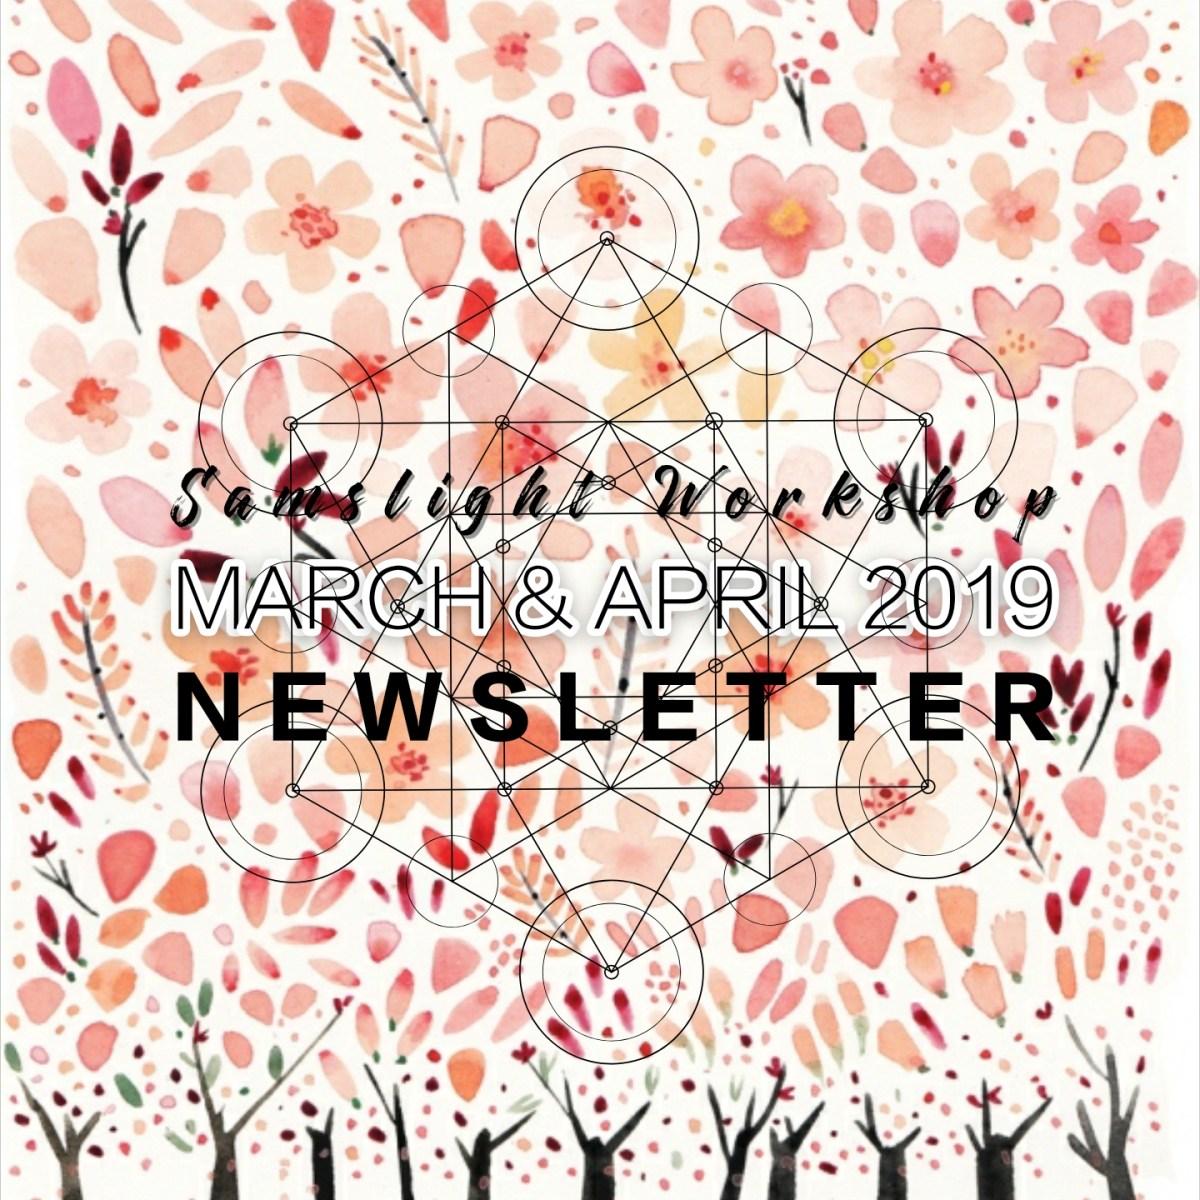 Mar&Apr2019 Newsletter